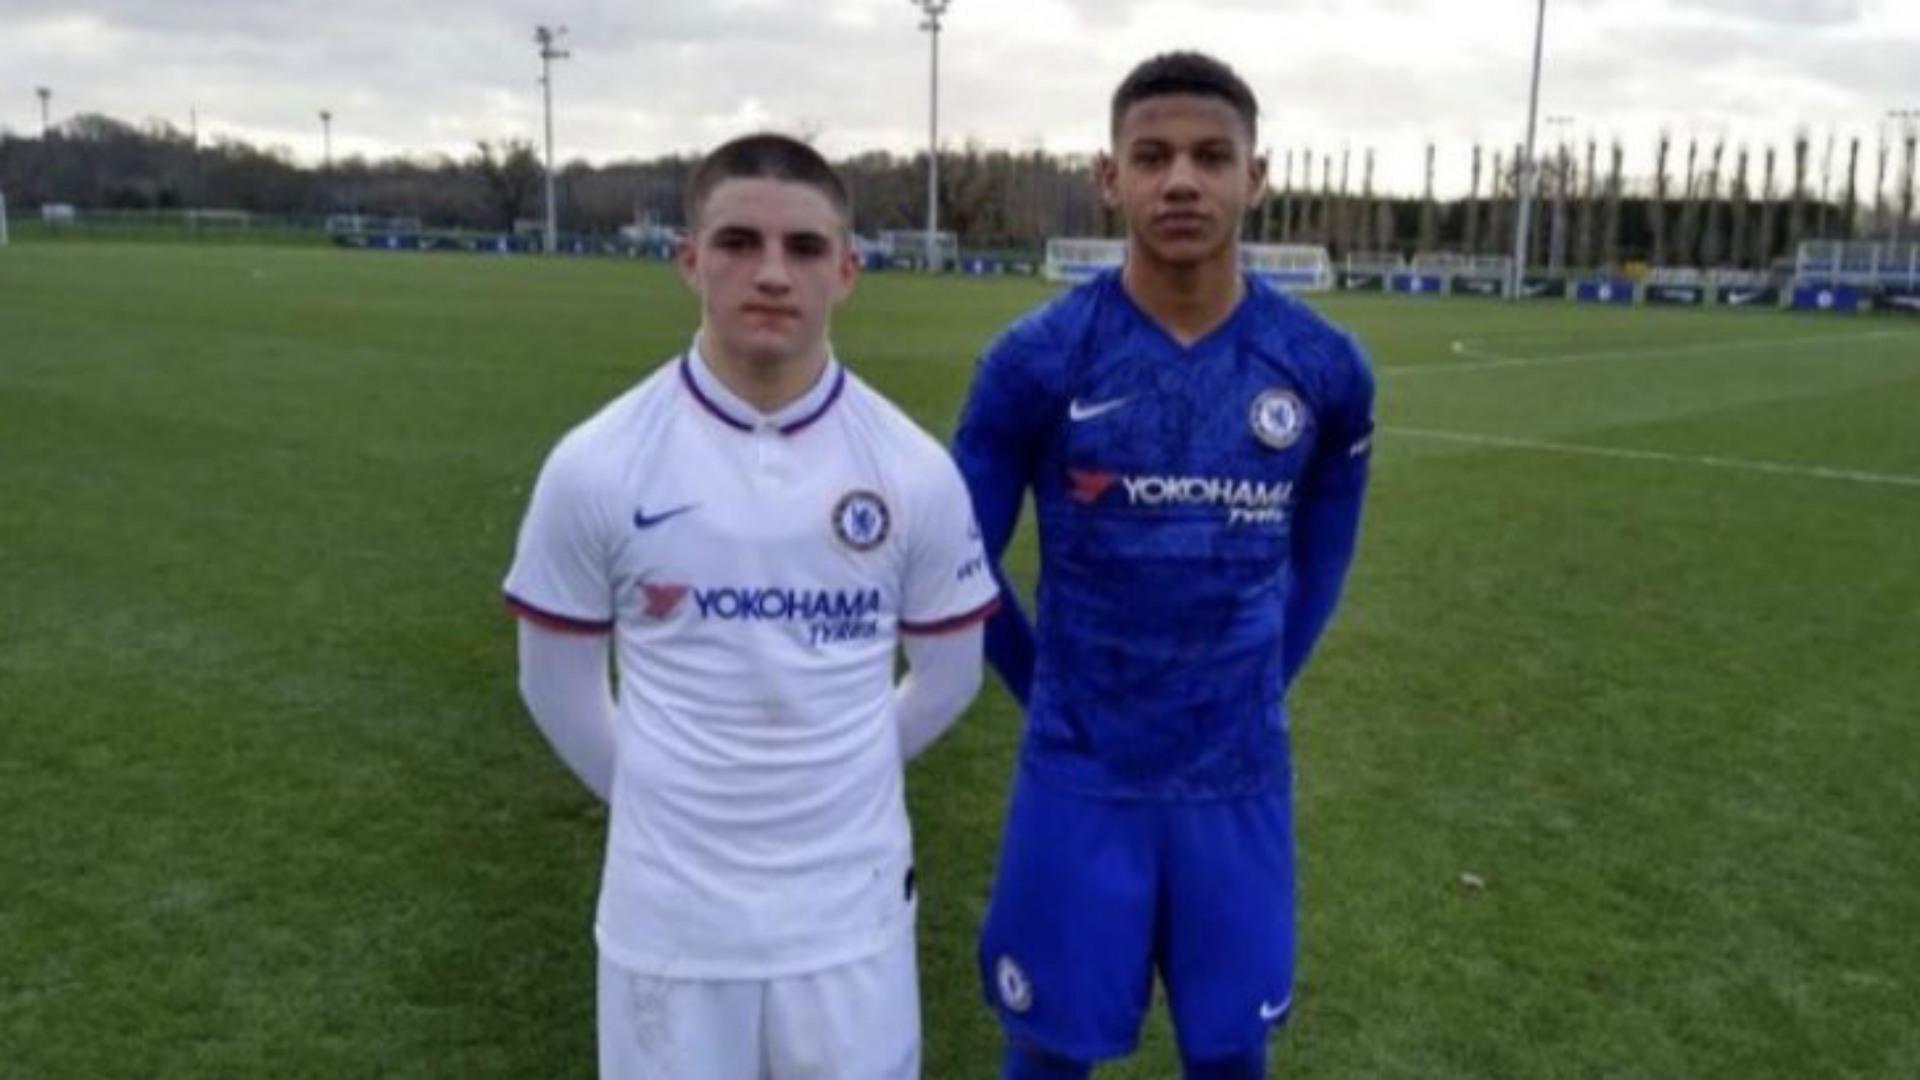 Chelsea FC agree deal to sign Norwegian wonderkid